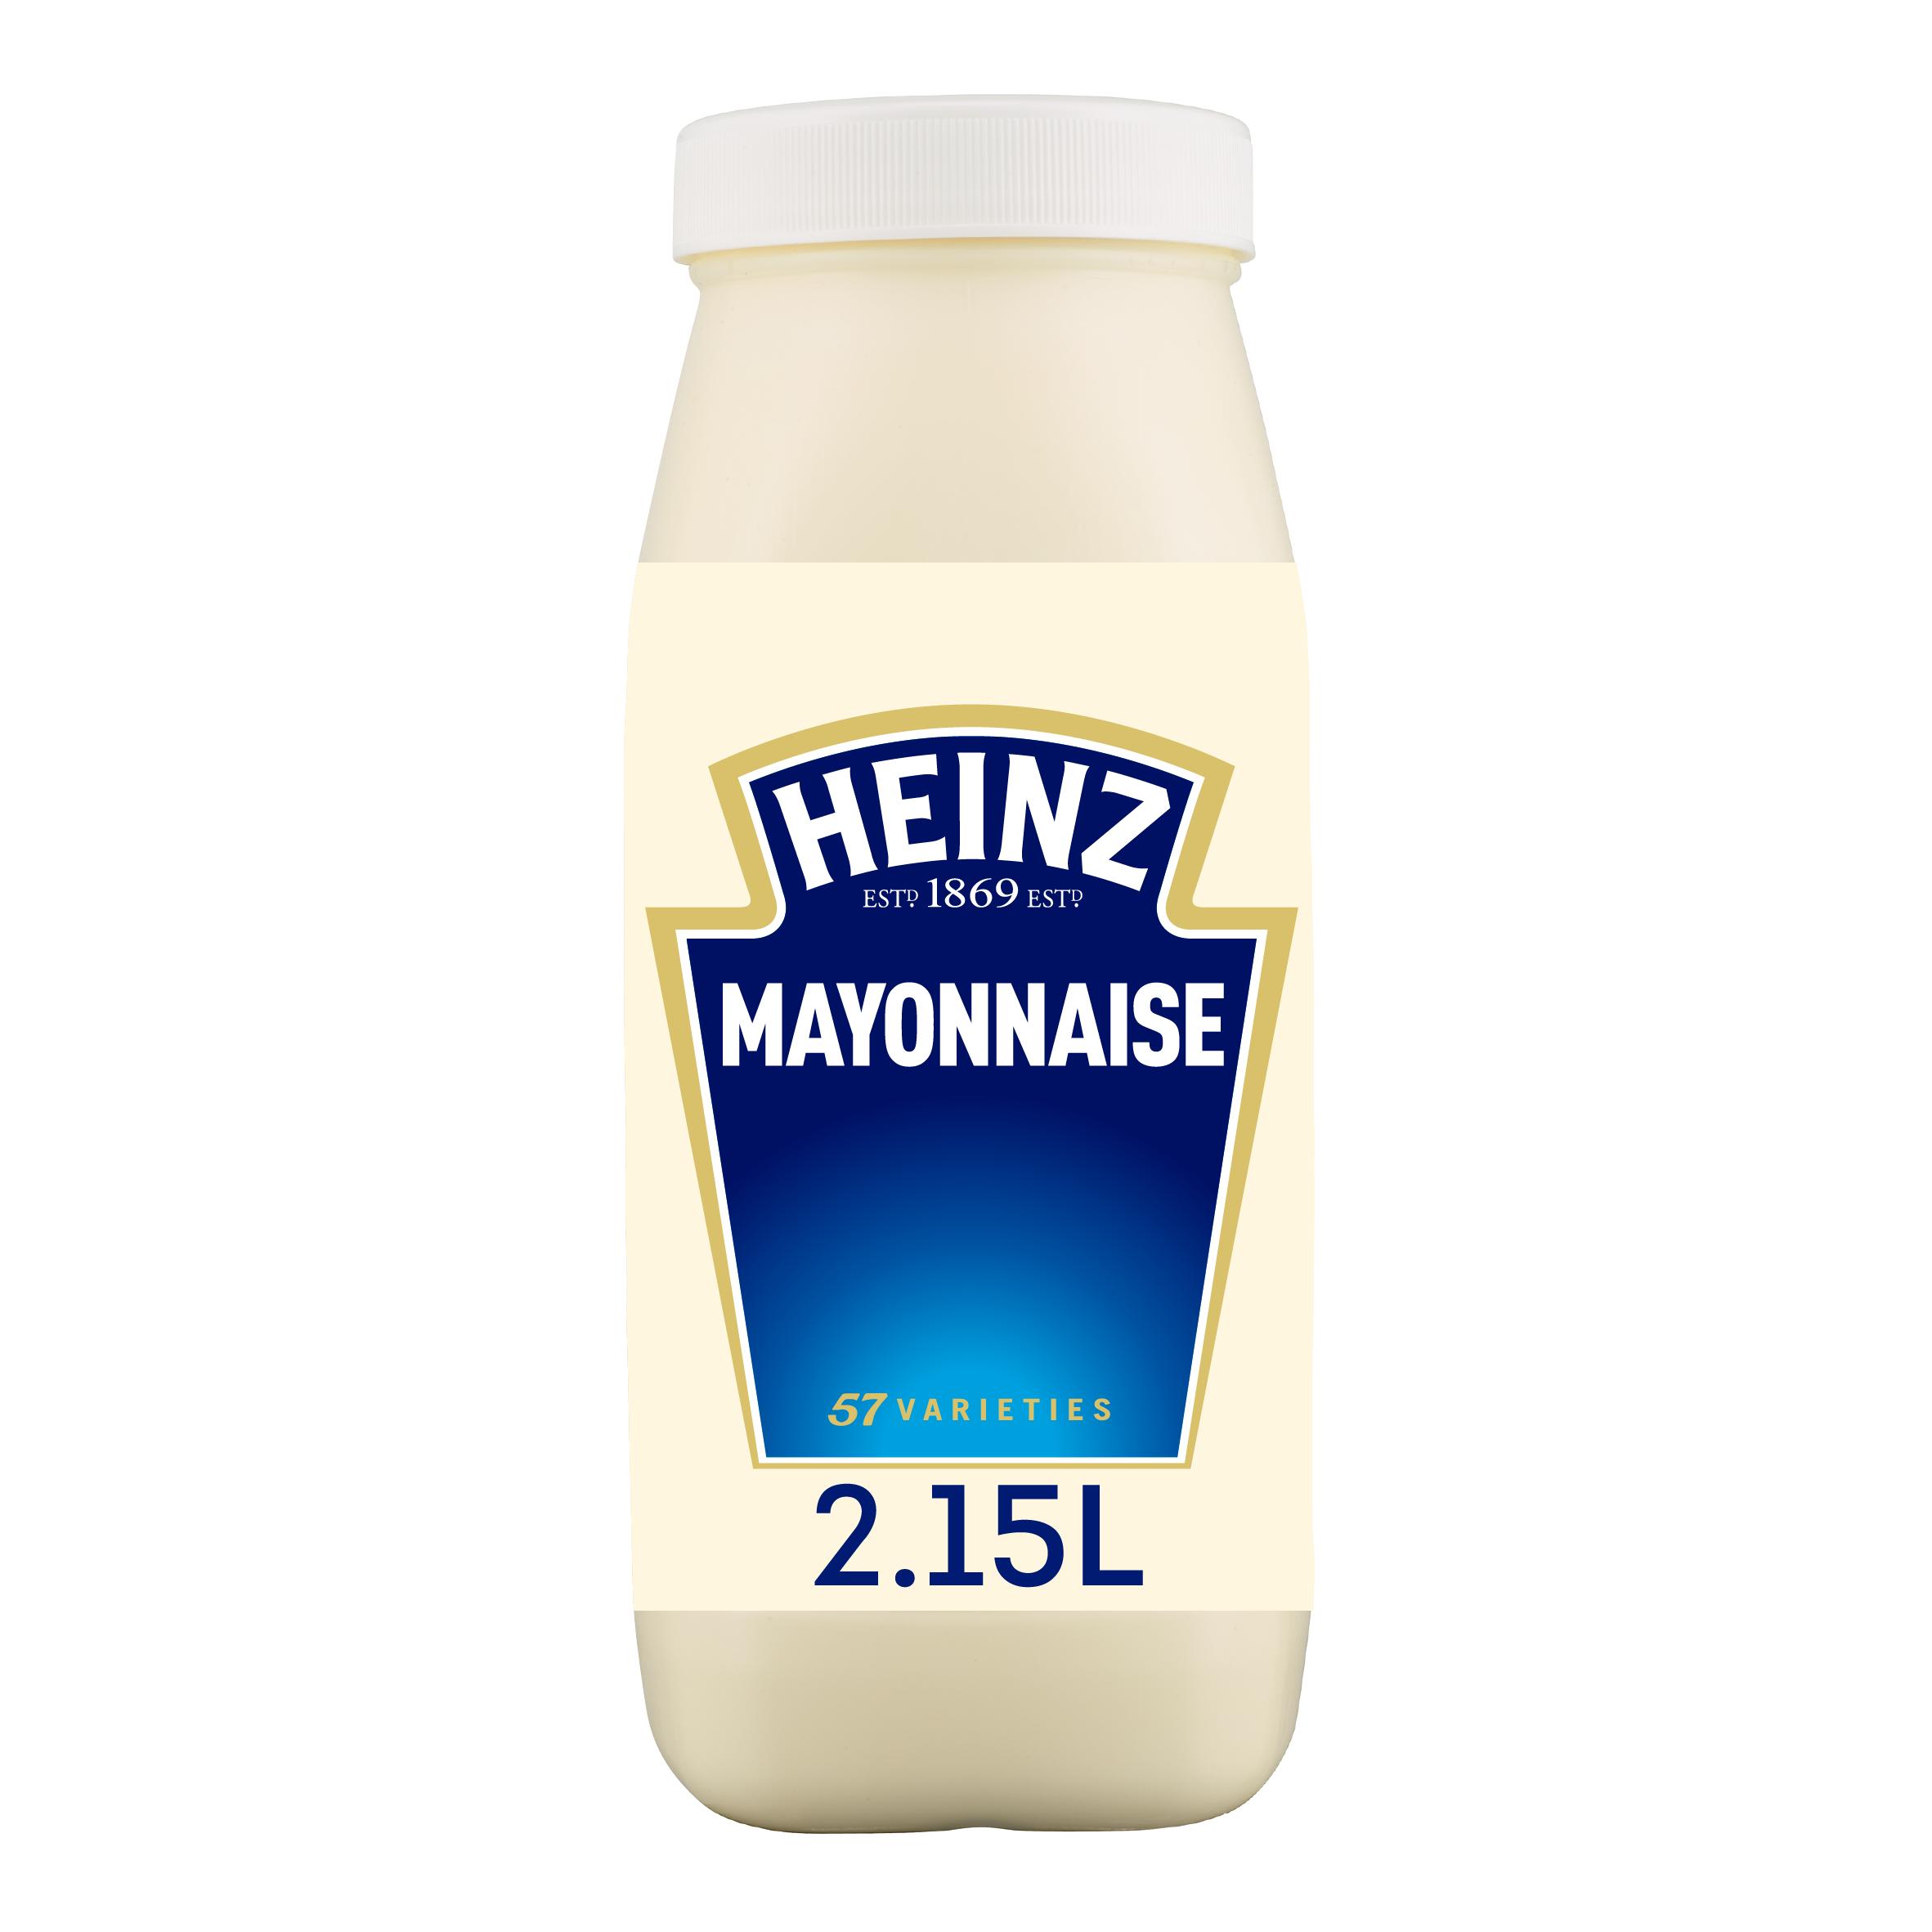 Heinz Mayonnaise 2.15L Jars image